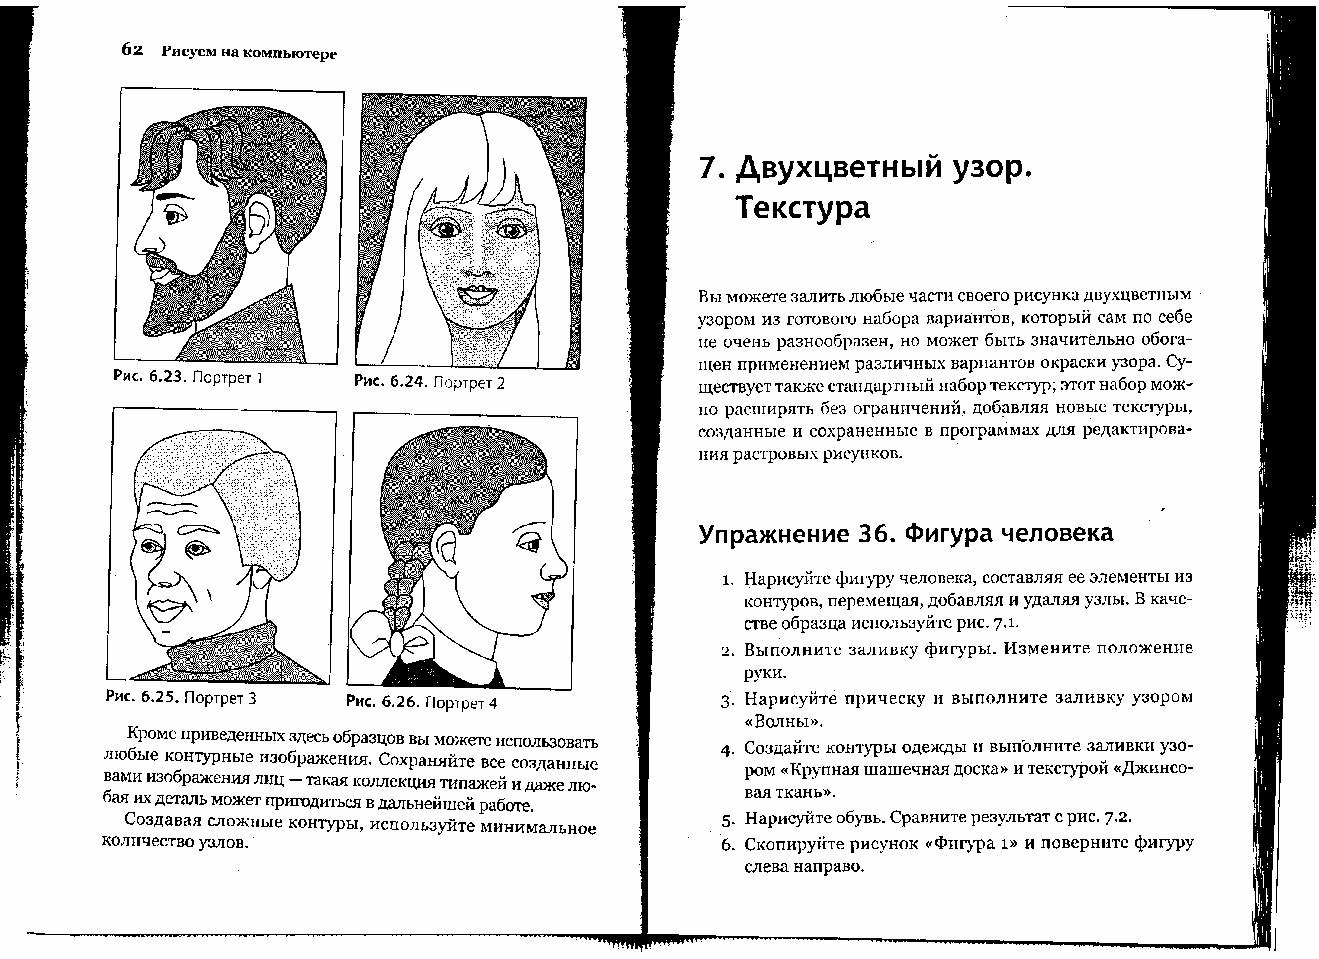 mso14318